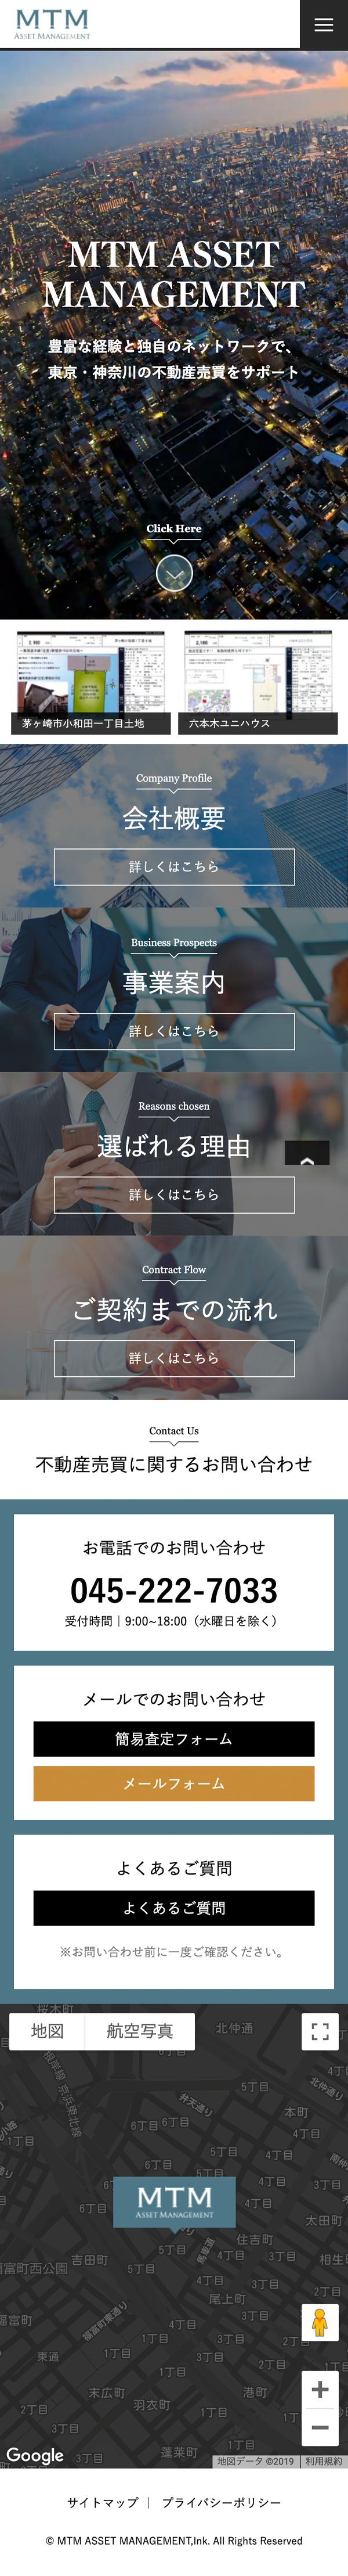 MTMアセットマネジメント|不動産売買・仲介 / コーポレートサイト